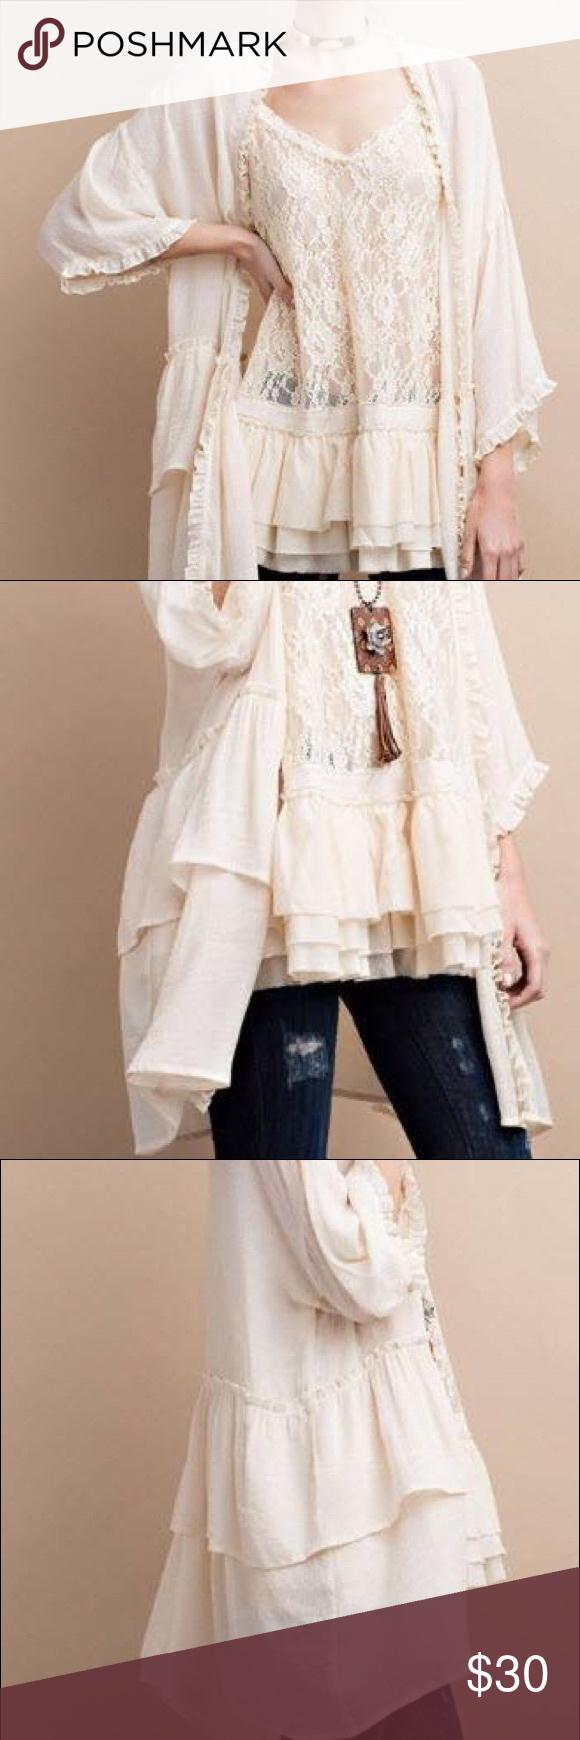 Selling this DOUBLE RUFFLED OPEN LONG CARDIGAN W/ RUFFLED CUFF on Poshmark! My username is: mfuller75. #shopmycloset #poshmark #fashion #shopping #style #forsale #EASEL #Sweaters